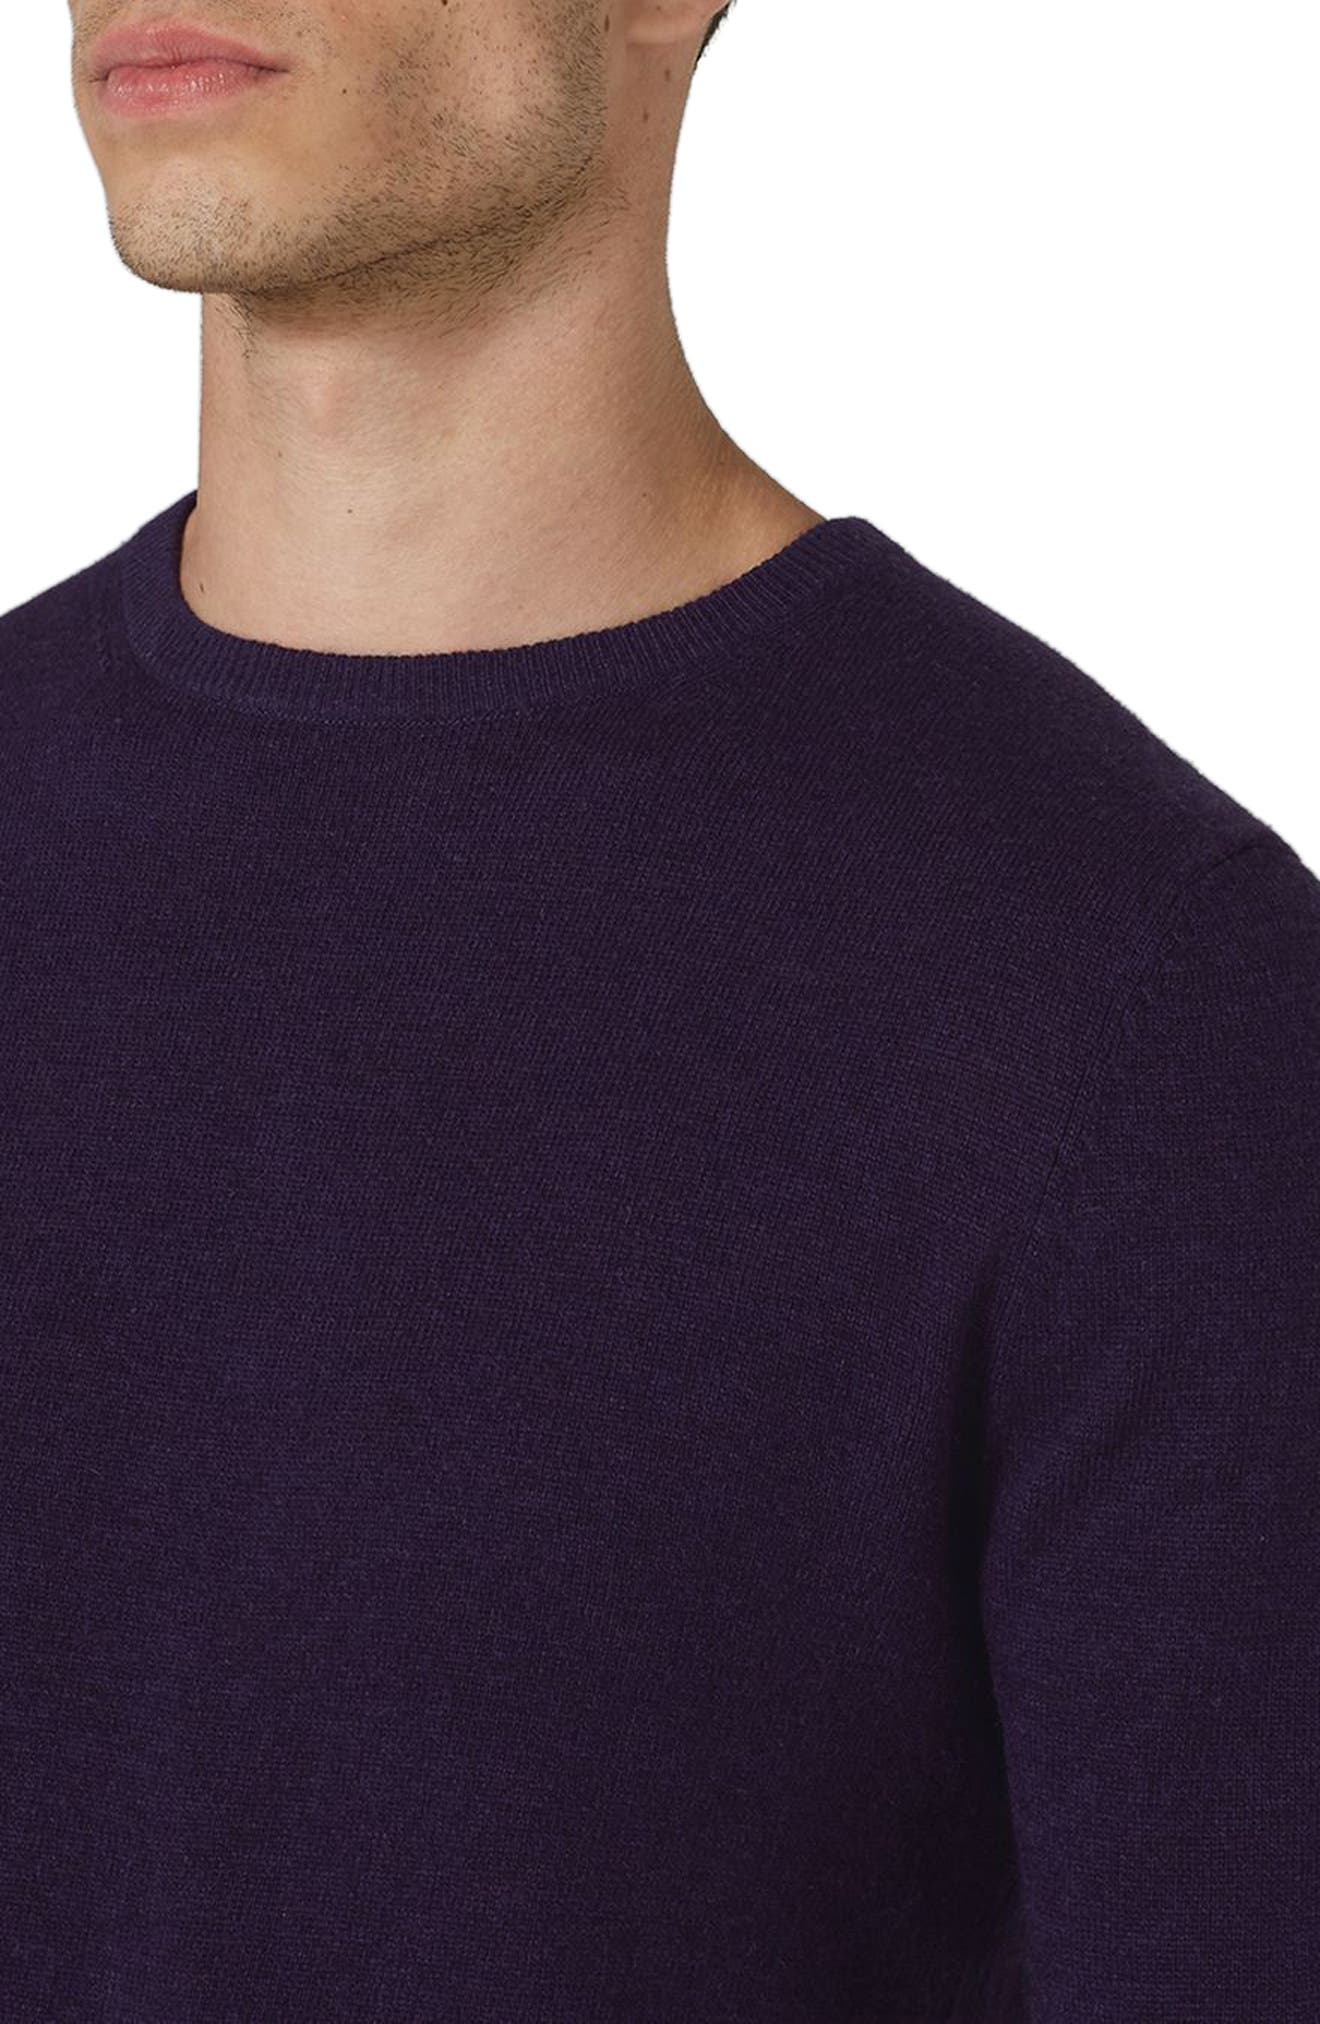 Slim Fit Crewneck Sweater,                             Alternate thumbnail 3, color,                             Dark Purple